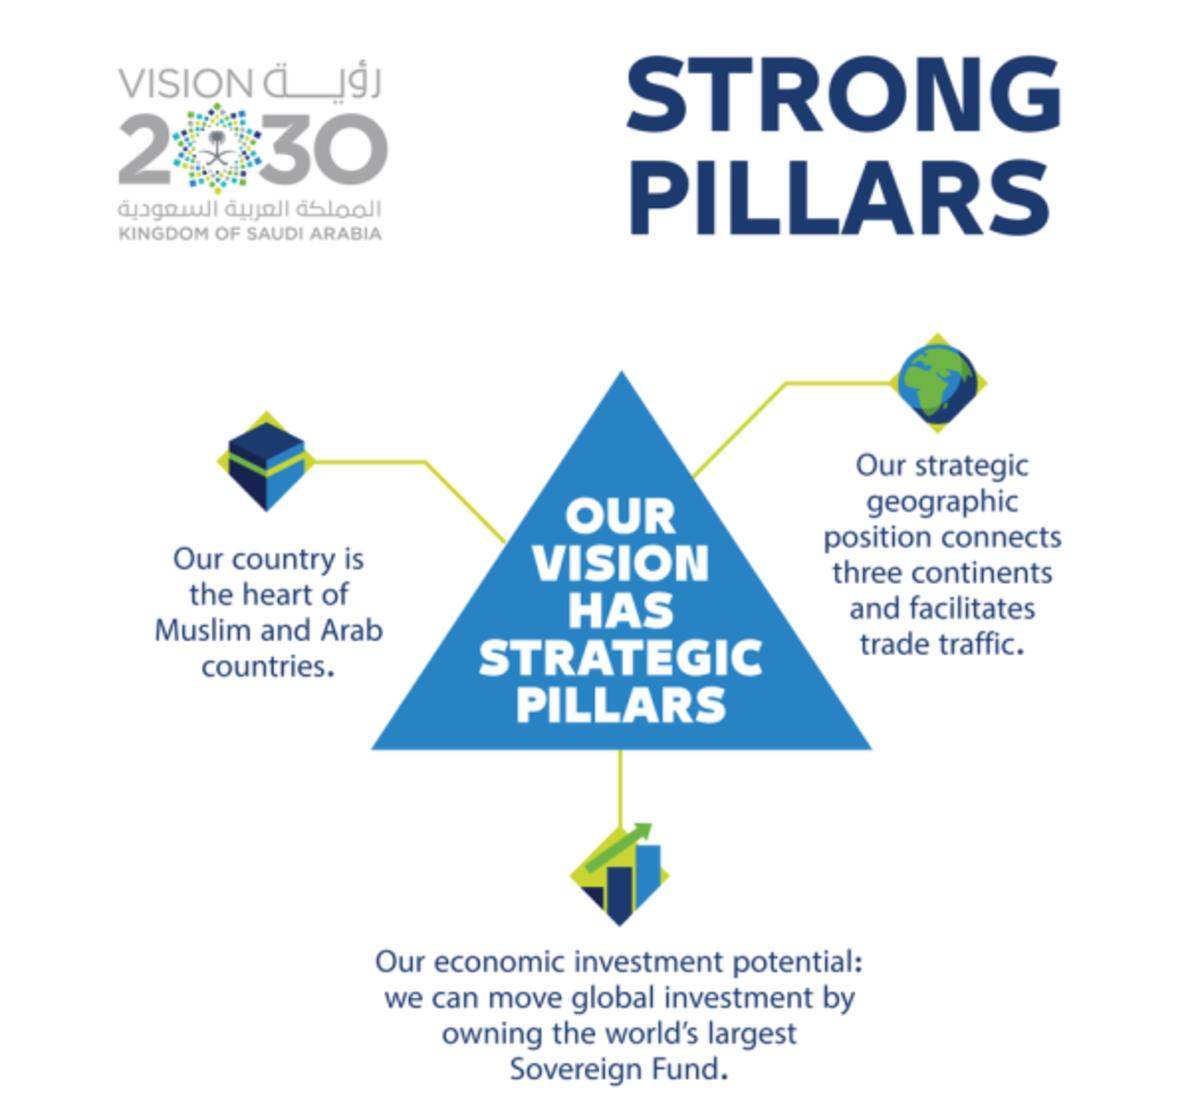 Vision 2030: The Three Pillars